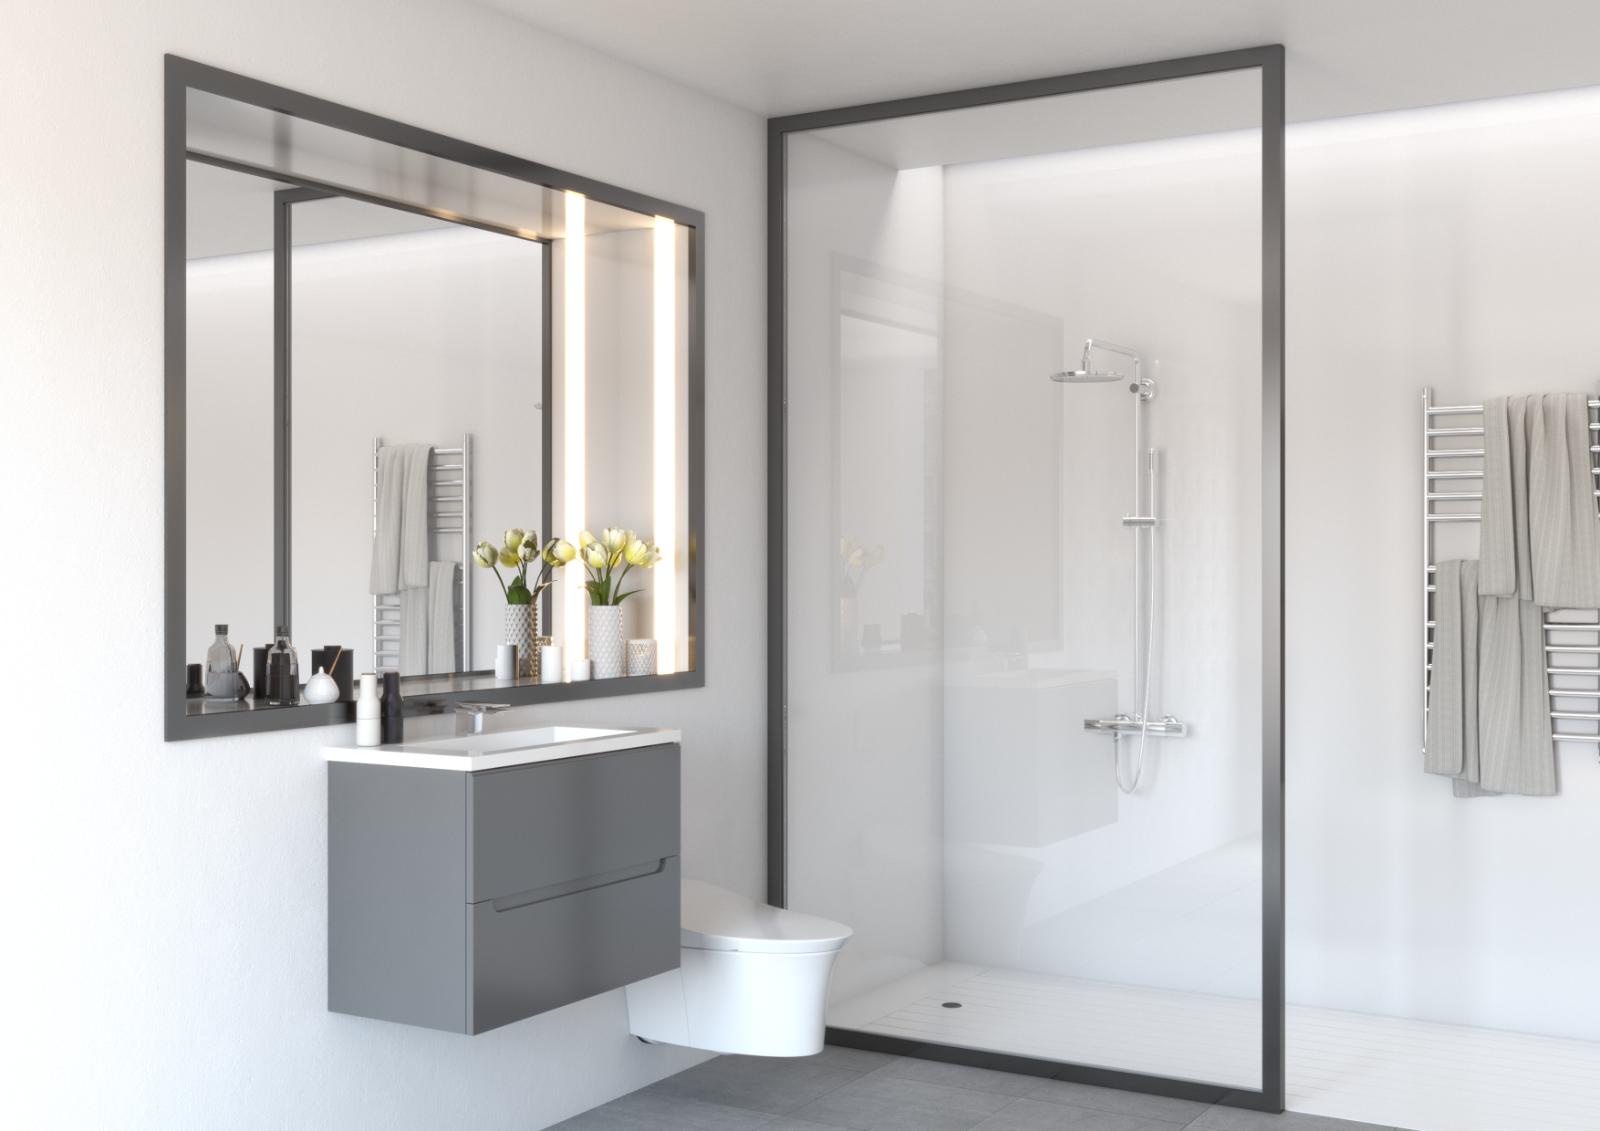 decorative white gloss bathroom shower wet wall panels pvc